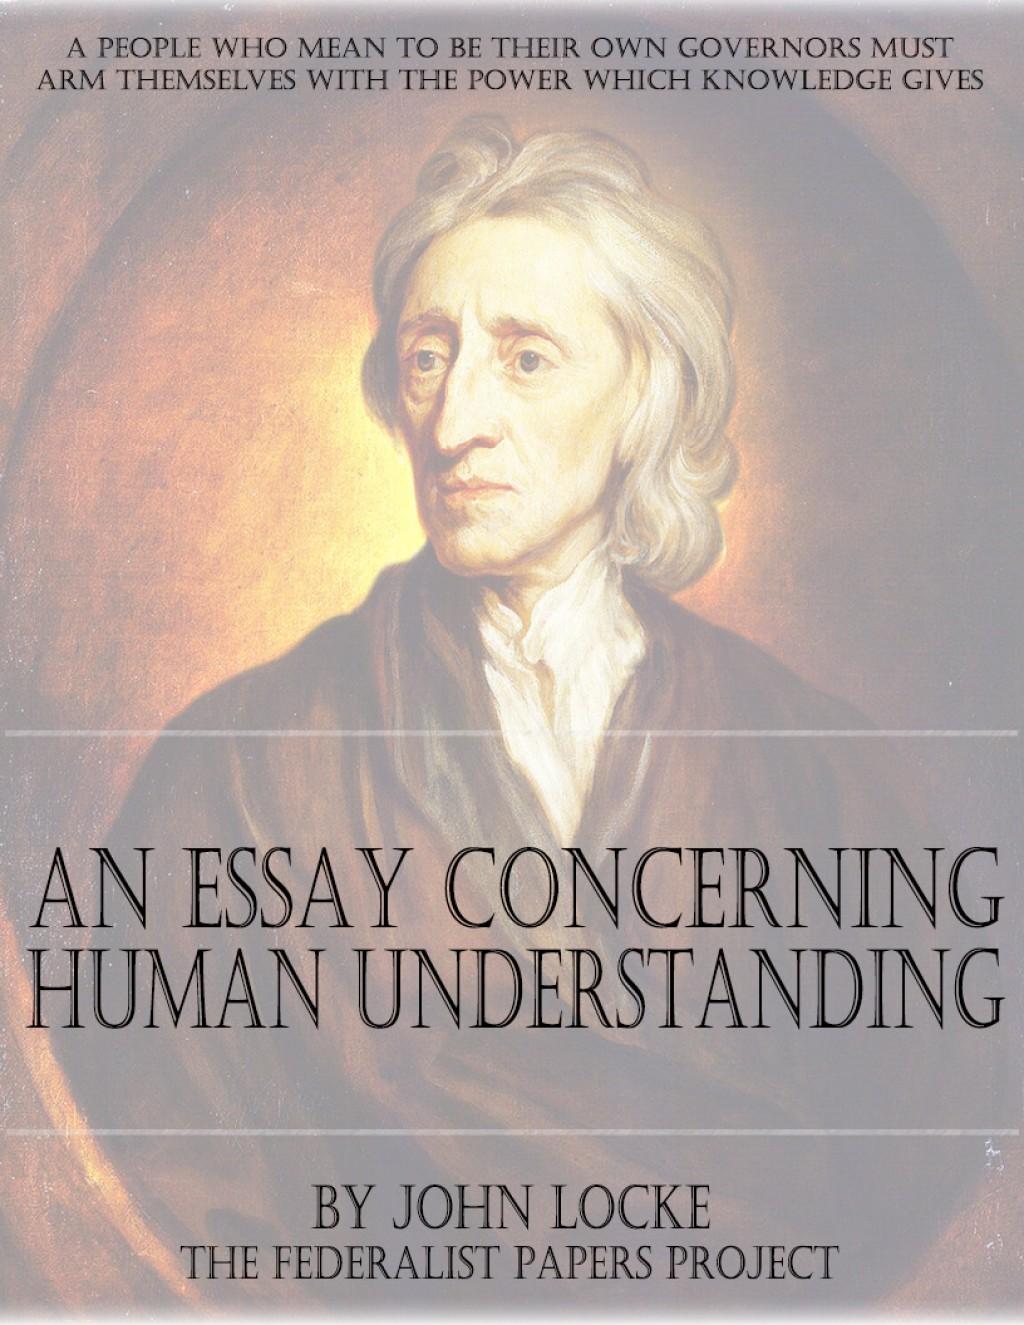 007 John Locke Essay An Concerning Human Understanding Cover Page1 Impressive Book 4 On Pdf Summary Large